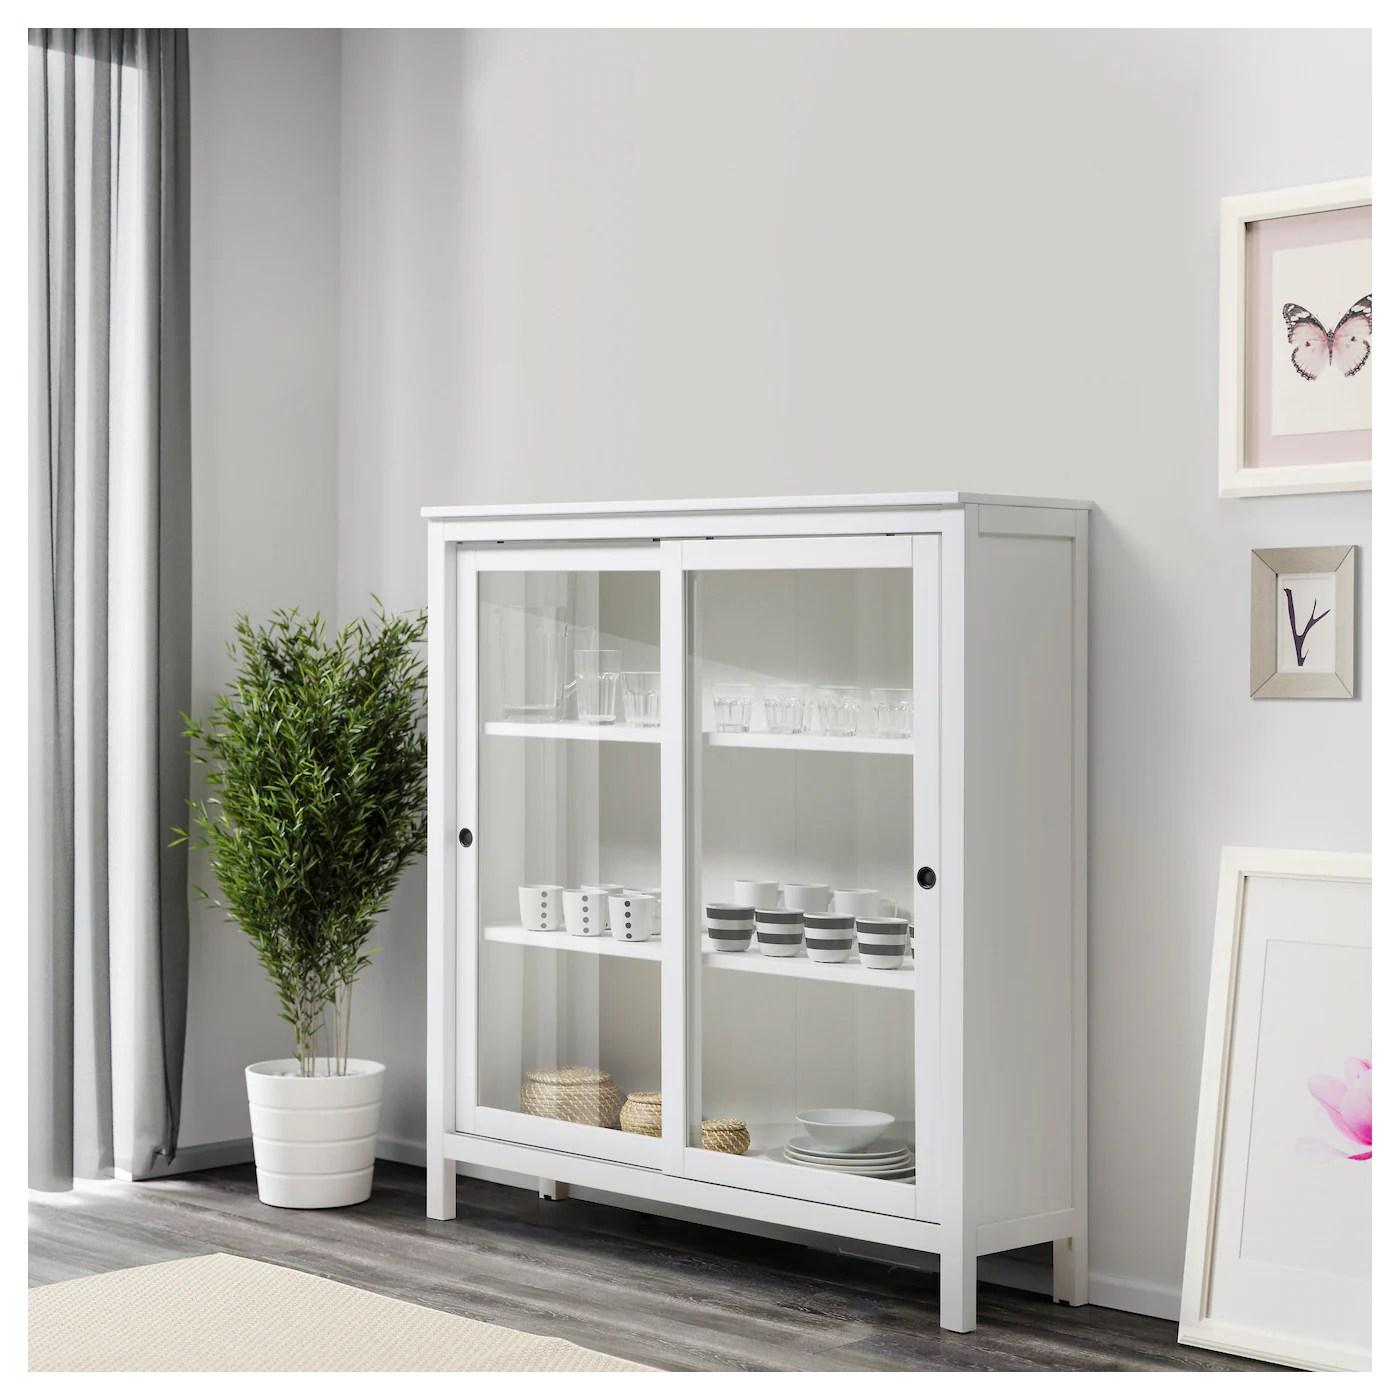 Hemnes Glass Door Cabinet White Stain 120 X 130 Cm